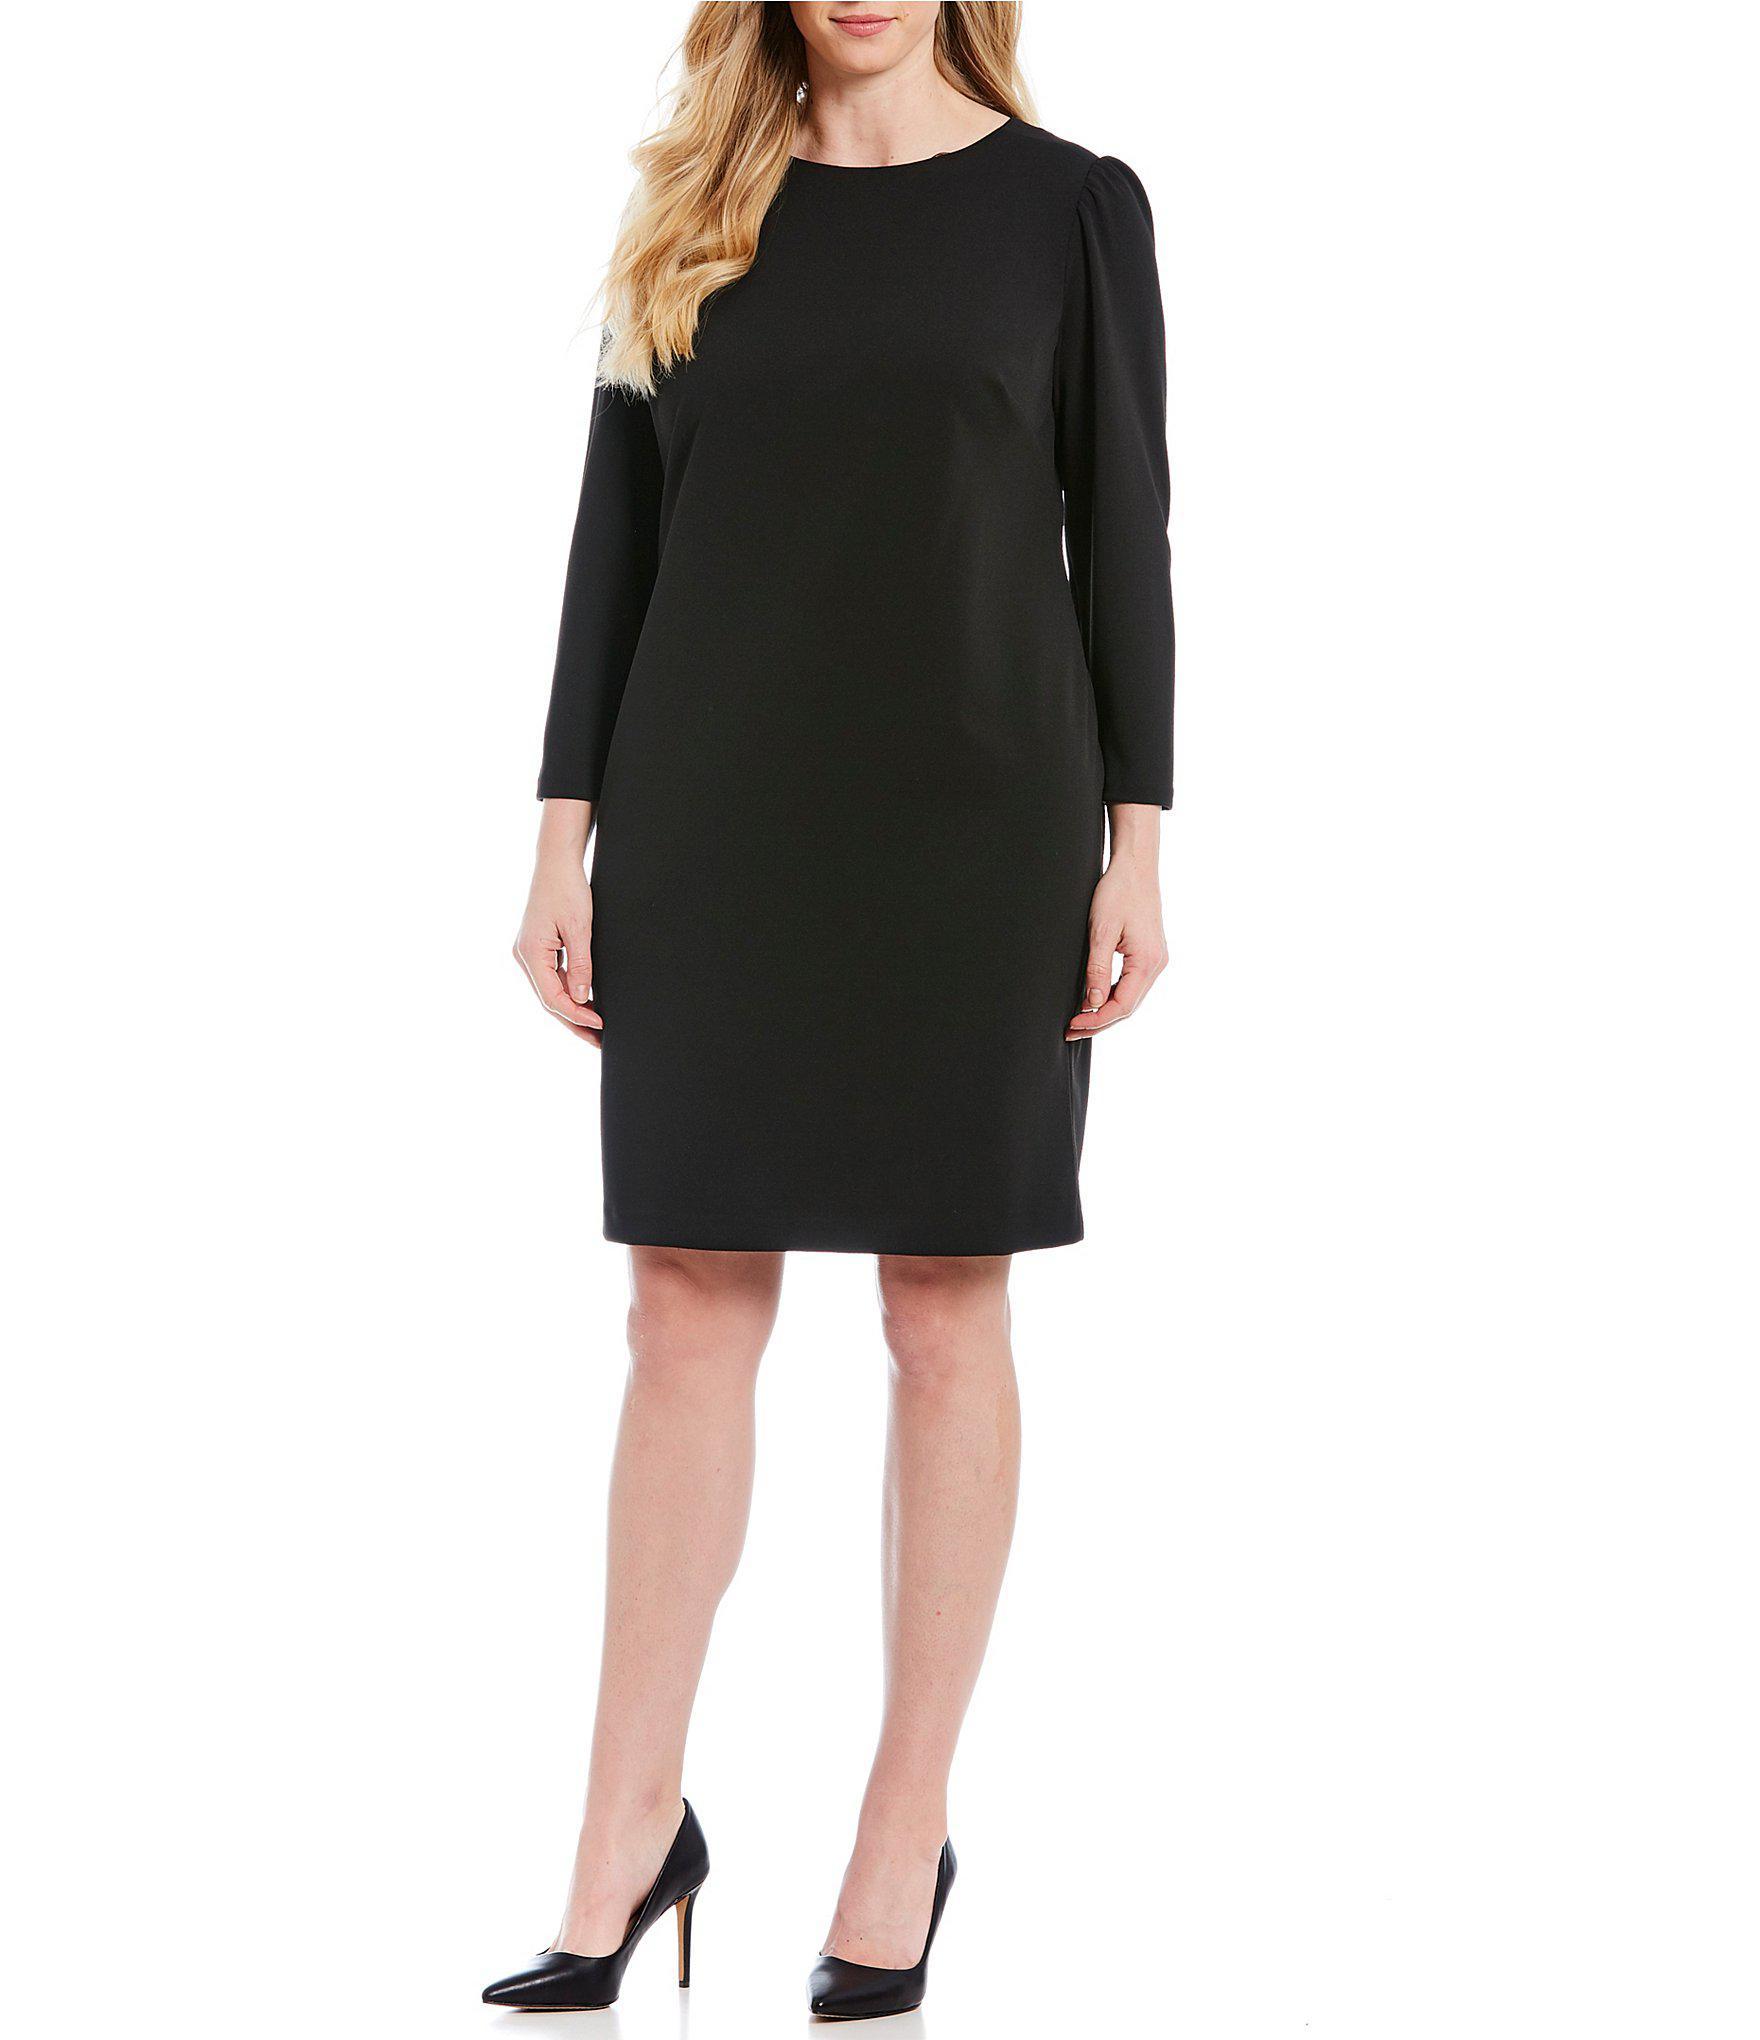 3d797f5145a Vince Camuto. Women s Black Plus Size Crepe Shift Dress.  134 From Dillard s